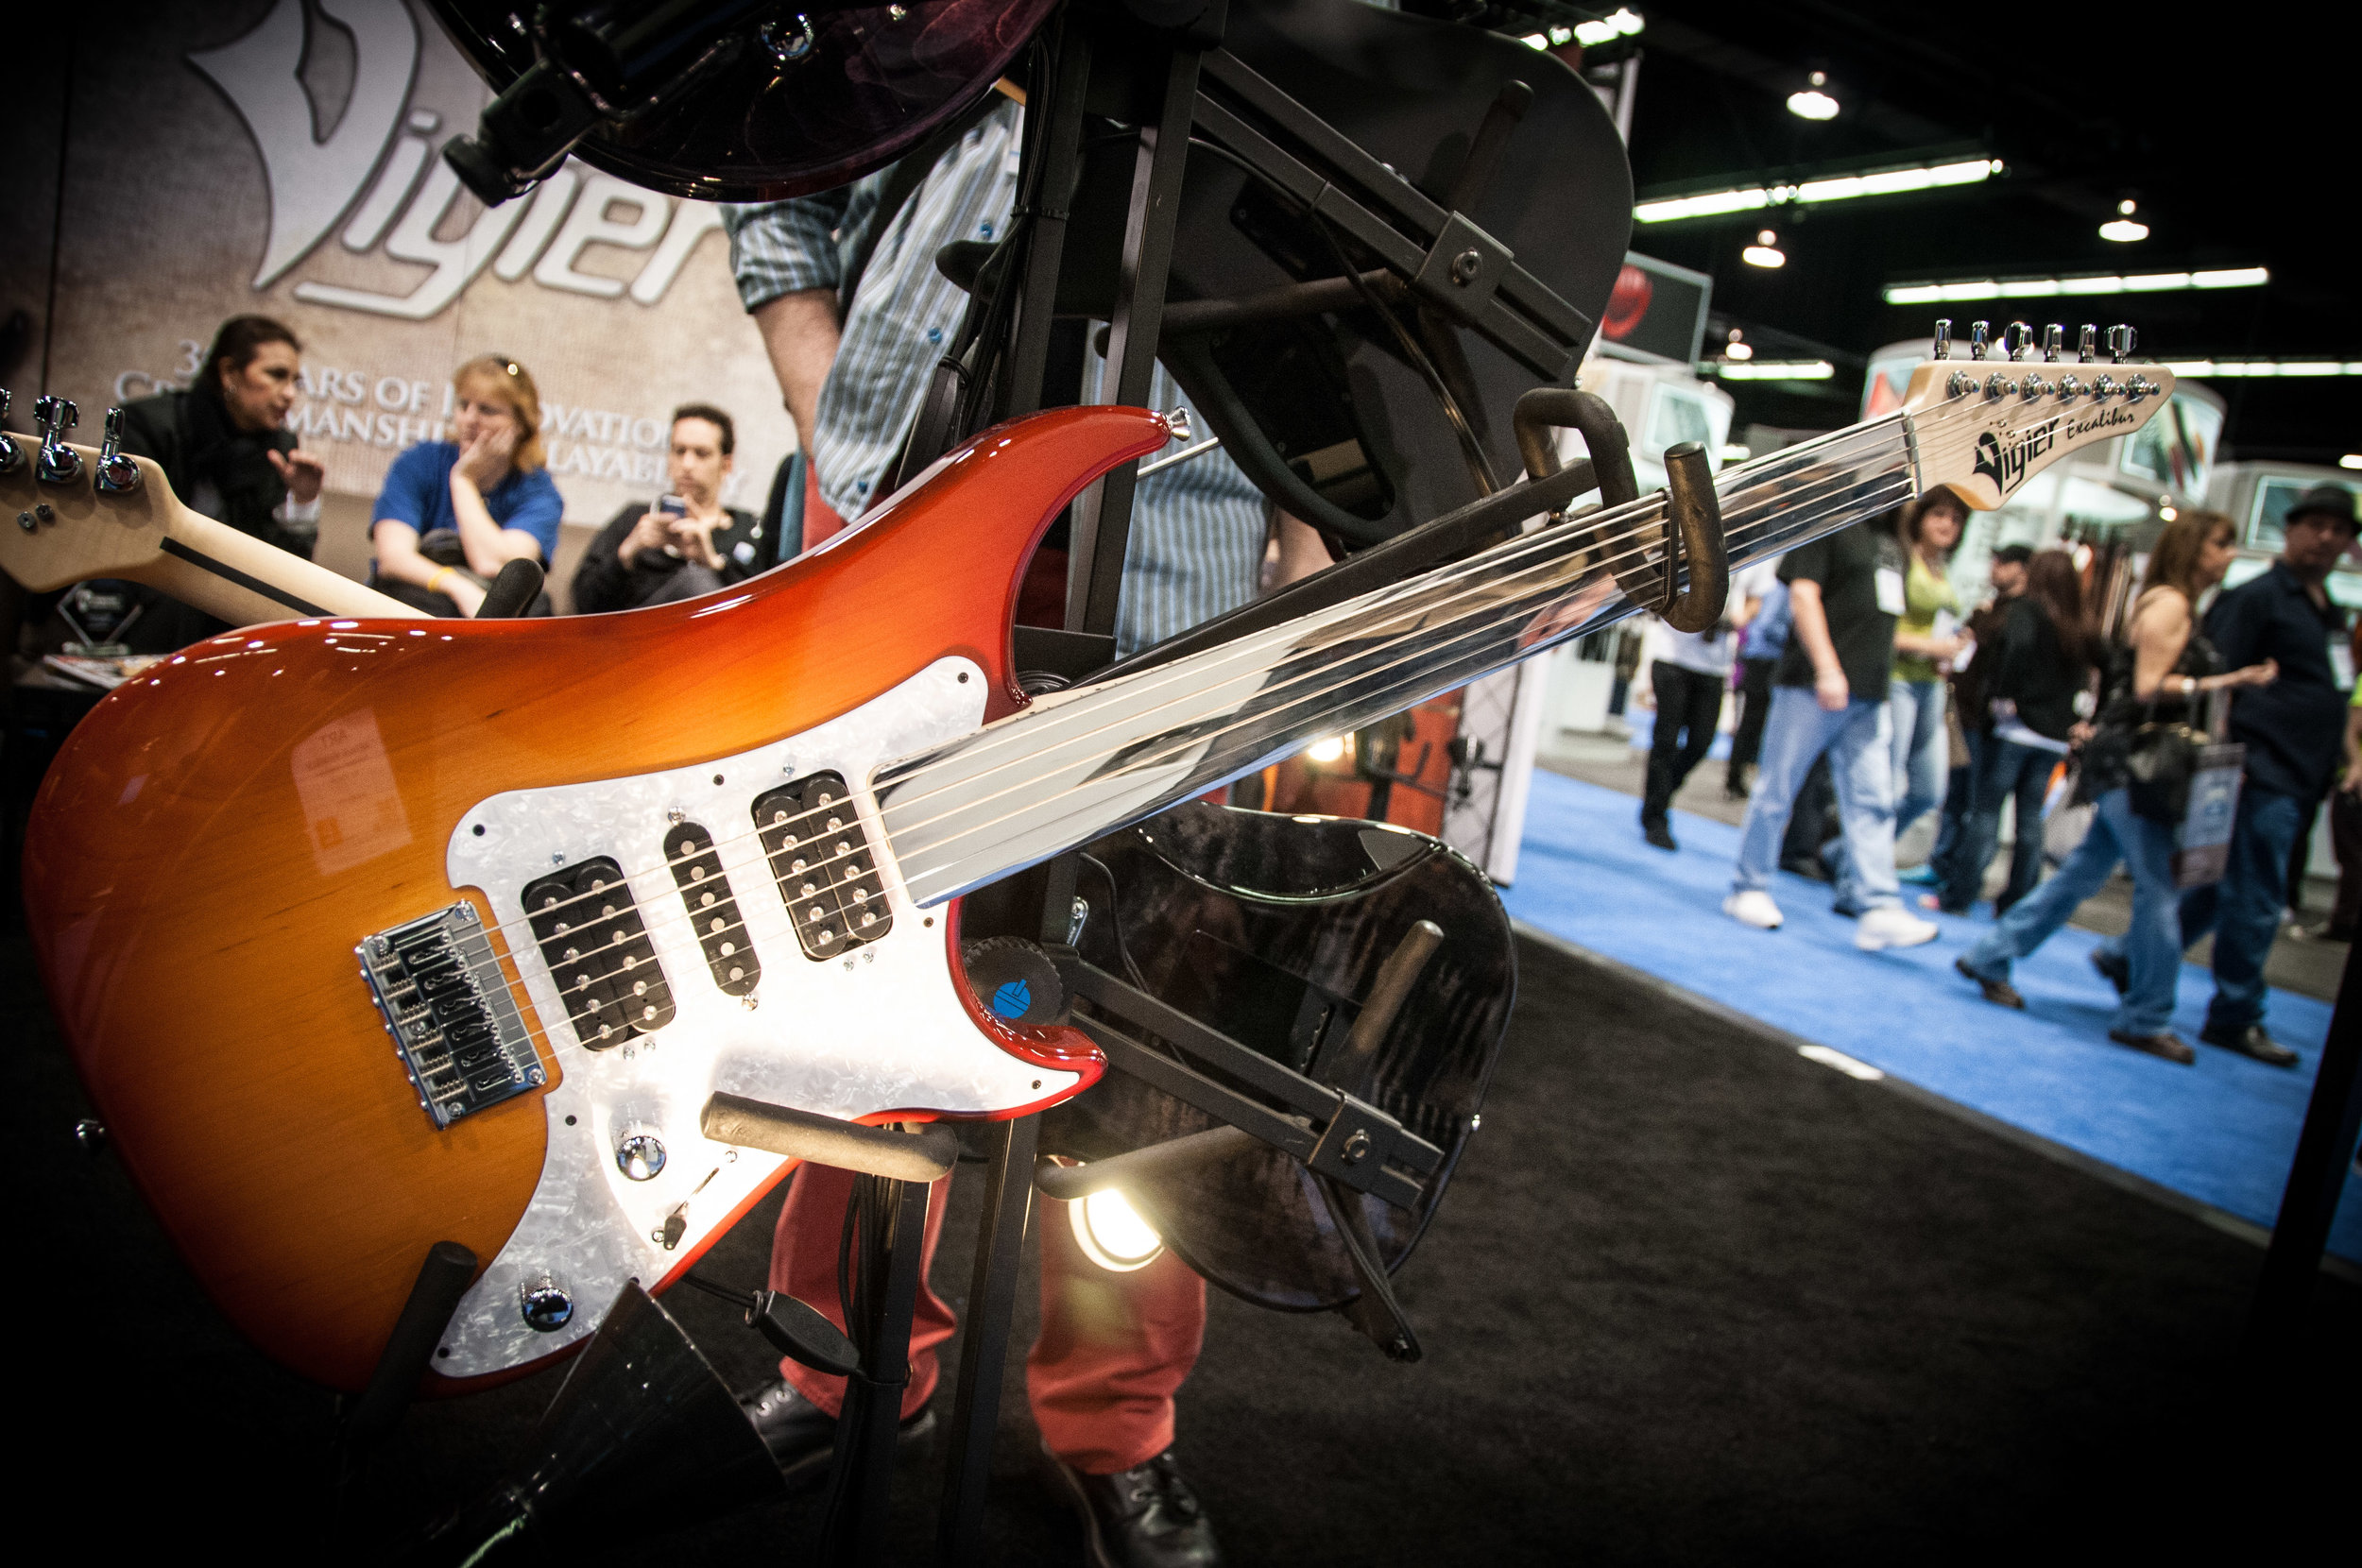 Vigier_Excalibur_Surfreter_Special_fretless_guitar_-_2014_NAMM_Show.jpg